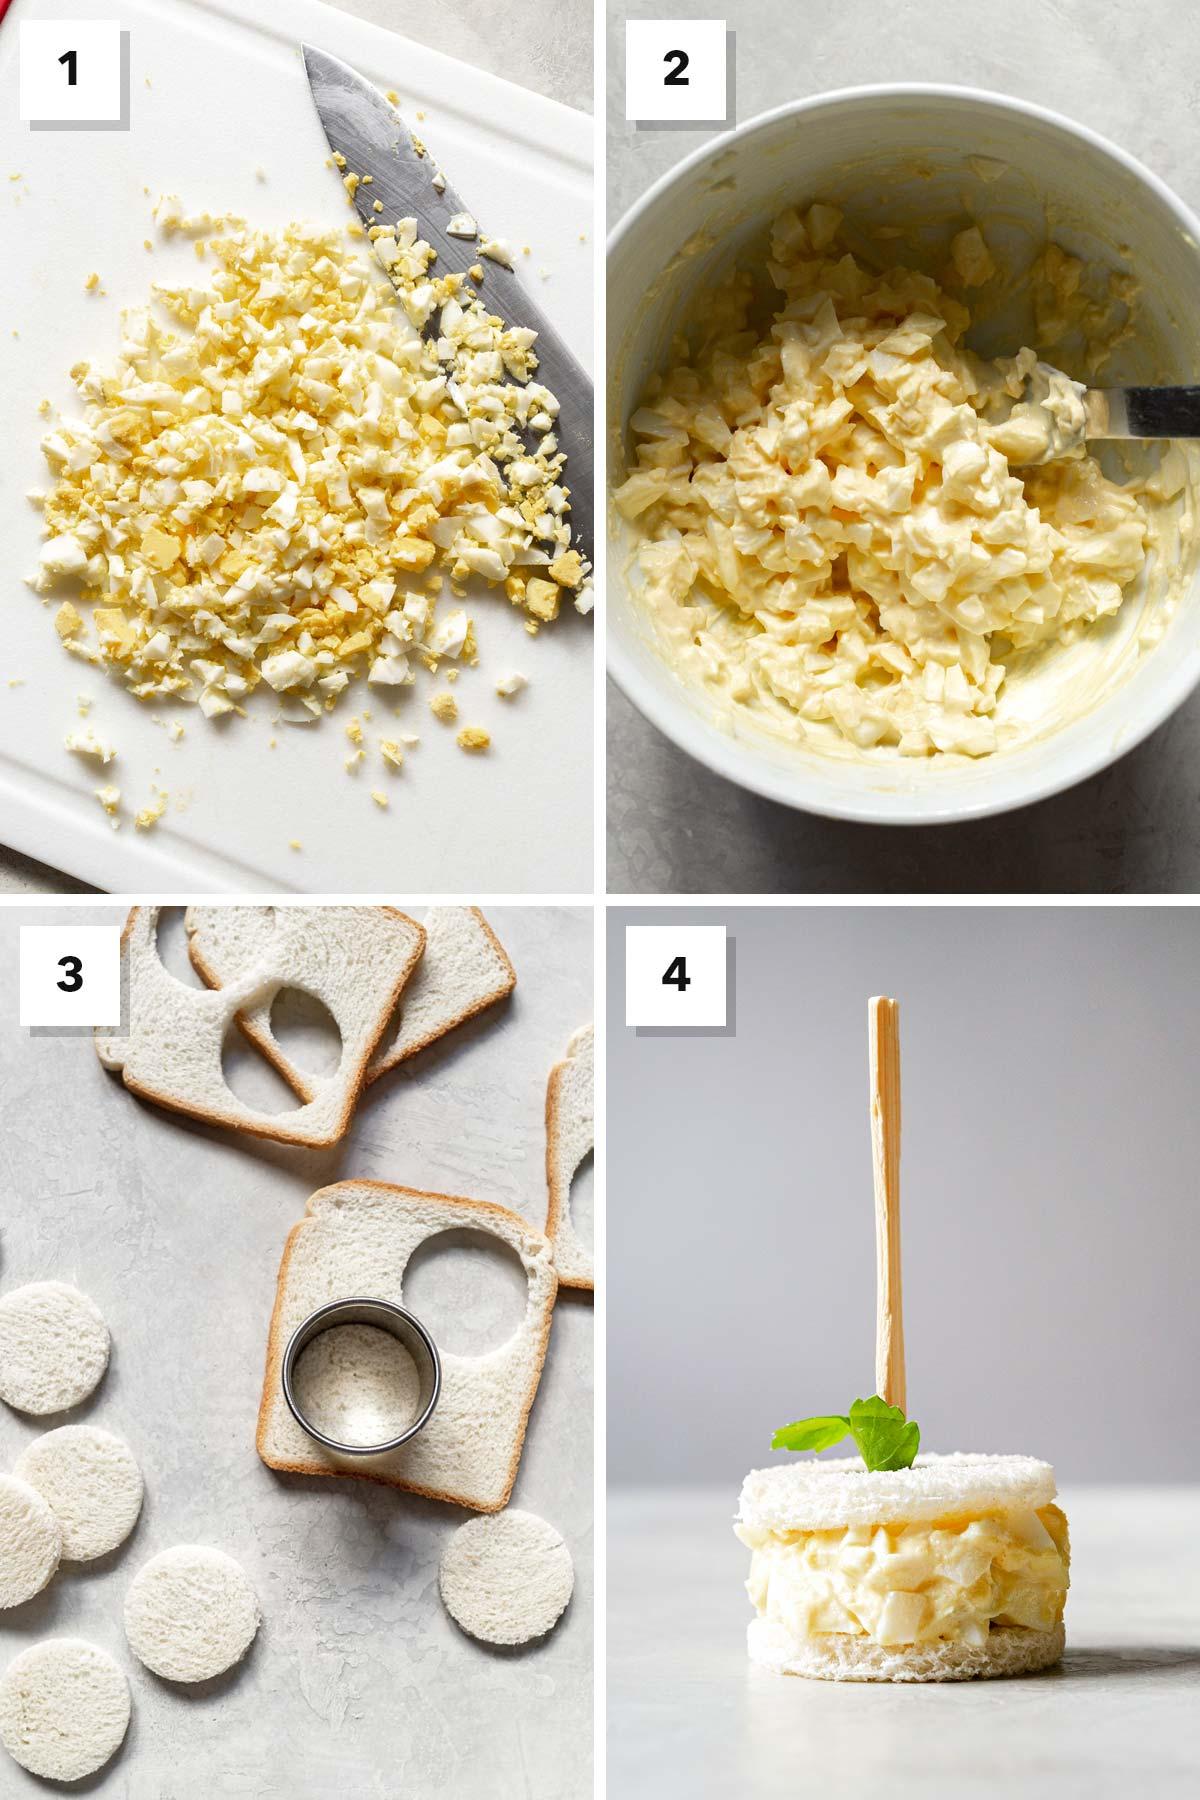 Steps to make egg salad tea sandwiches.